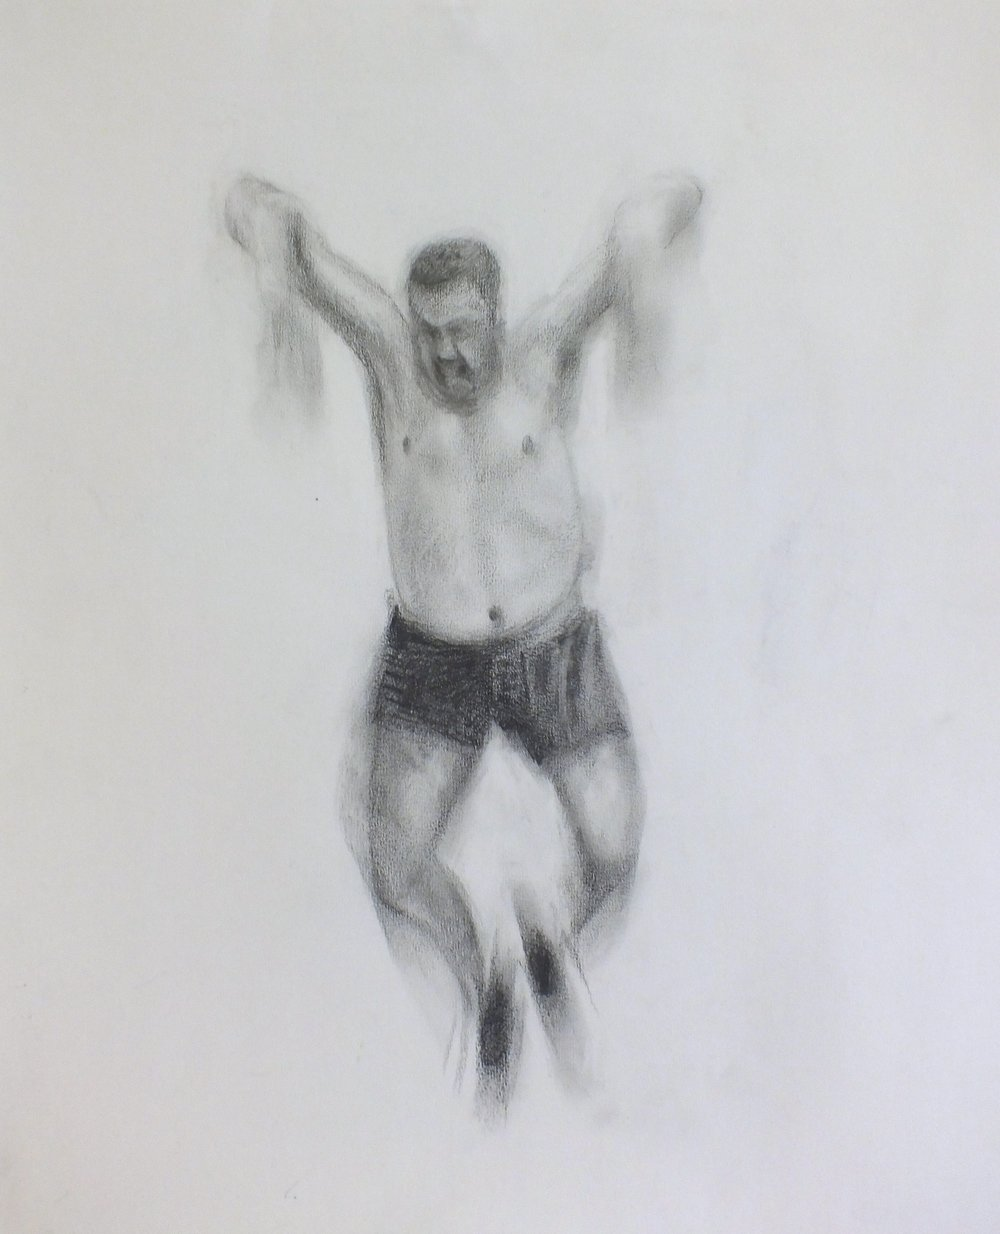 gdeerman 'White Man Dancing Triptych 1'.jpg